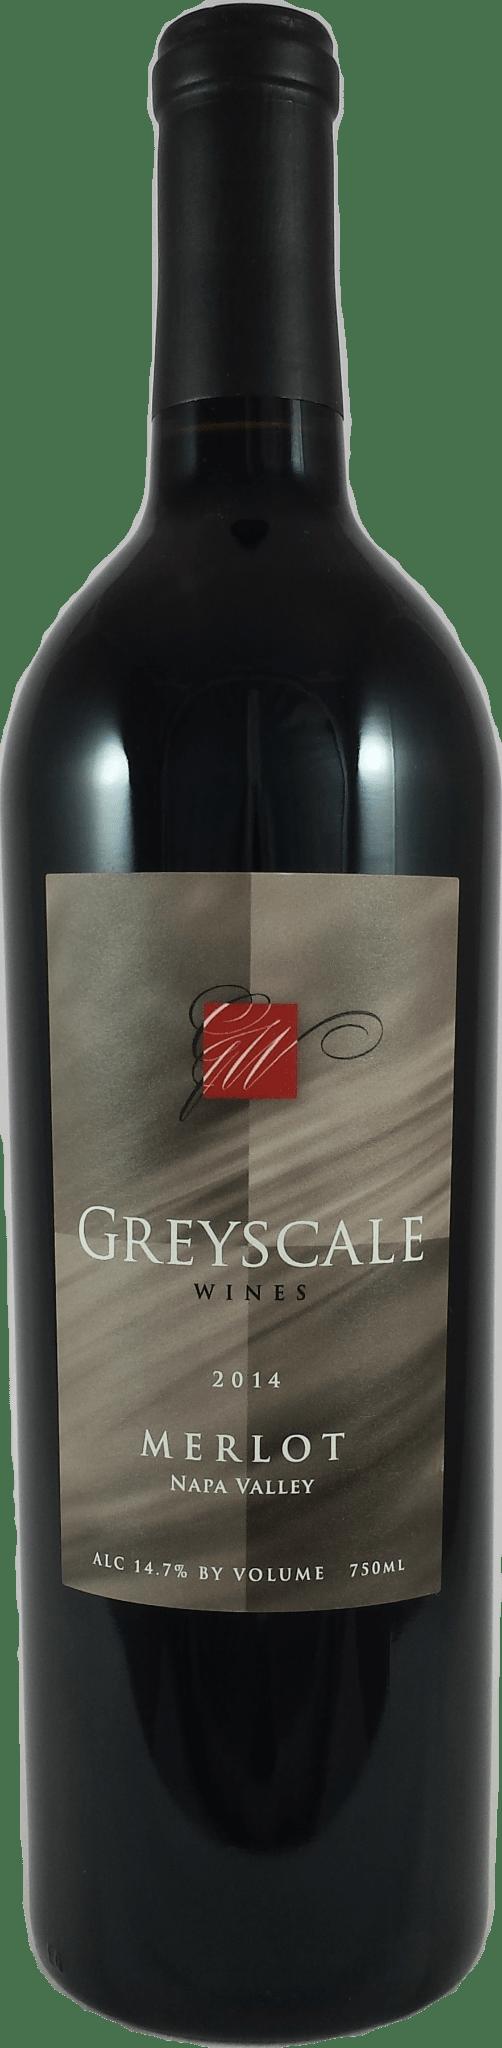 greyscale-14merlot-bottle1-1-1-1